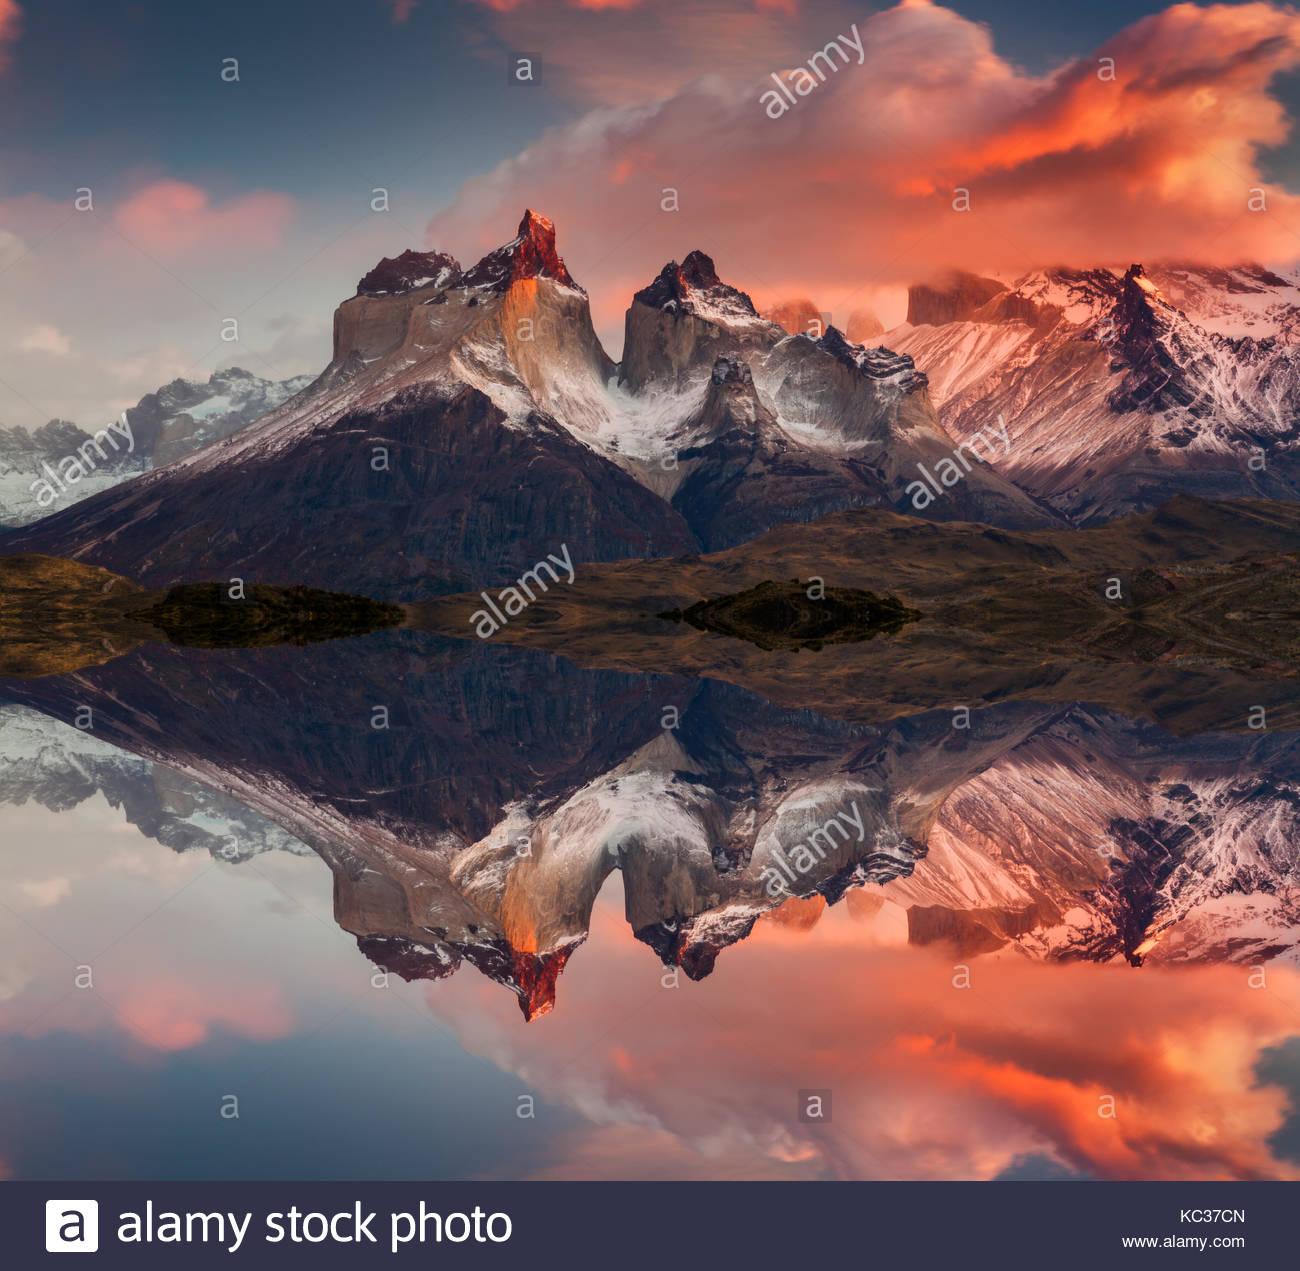 Sunrise nel parco nazionale Torres del Paine, lago pehoe e montagne cuernos, Patagonia, Cile Immagini Stock